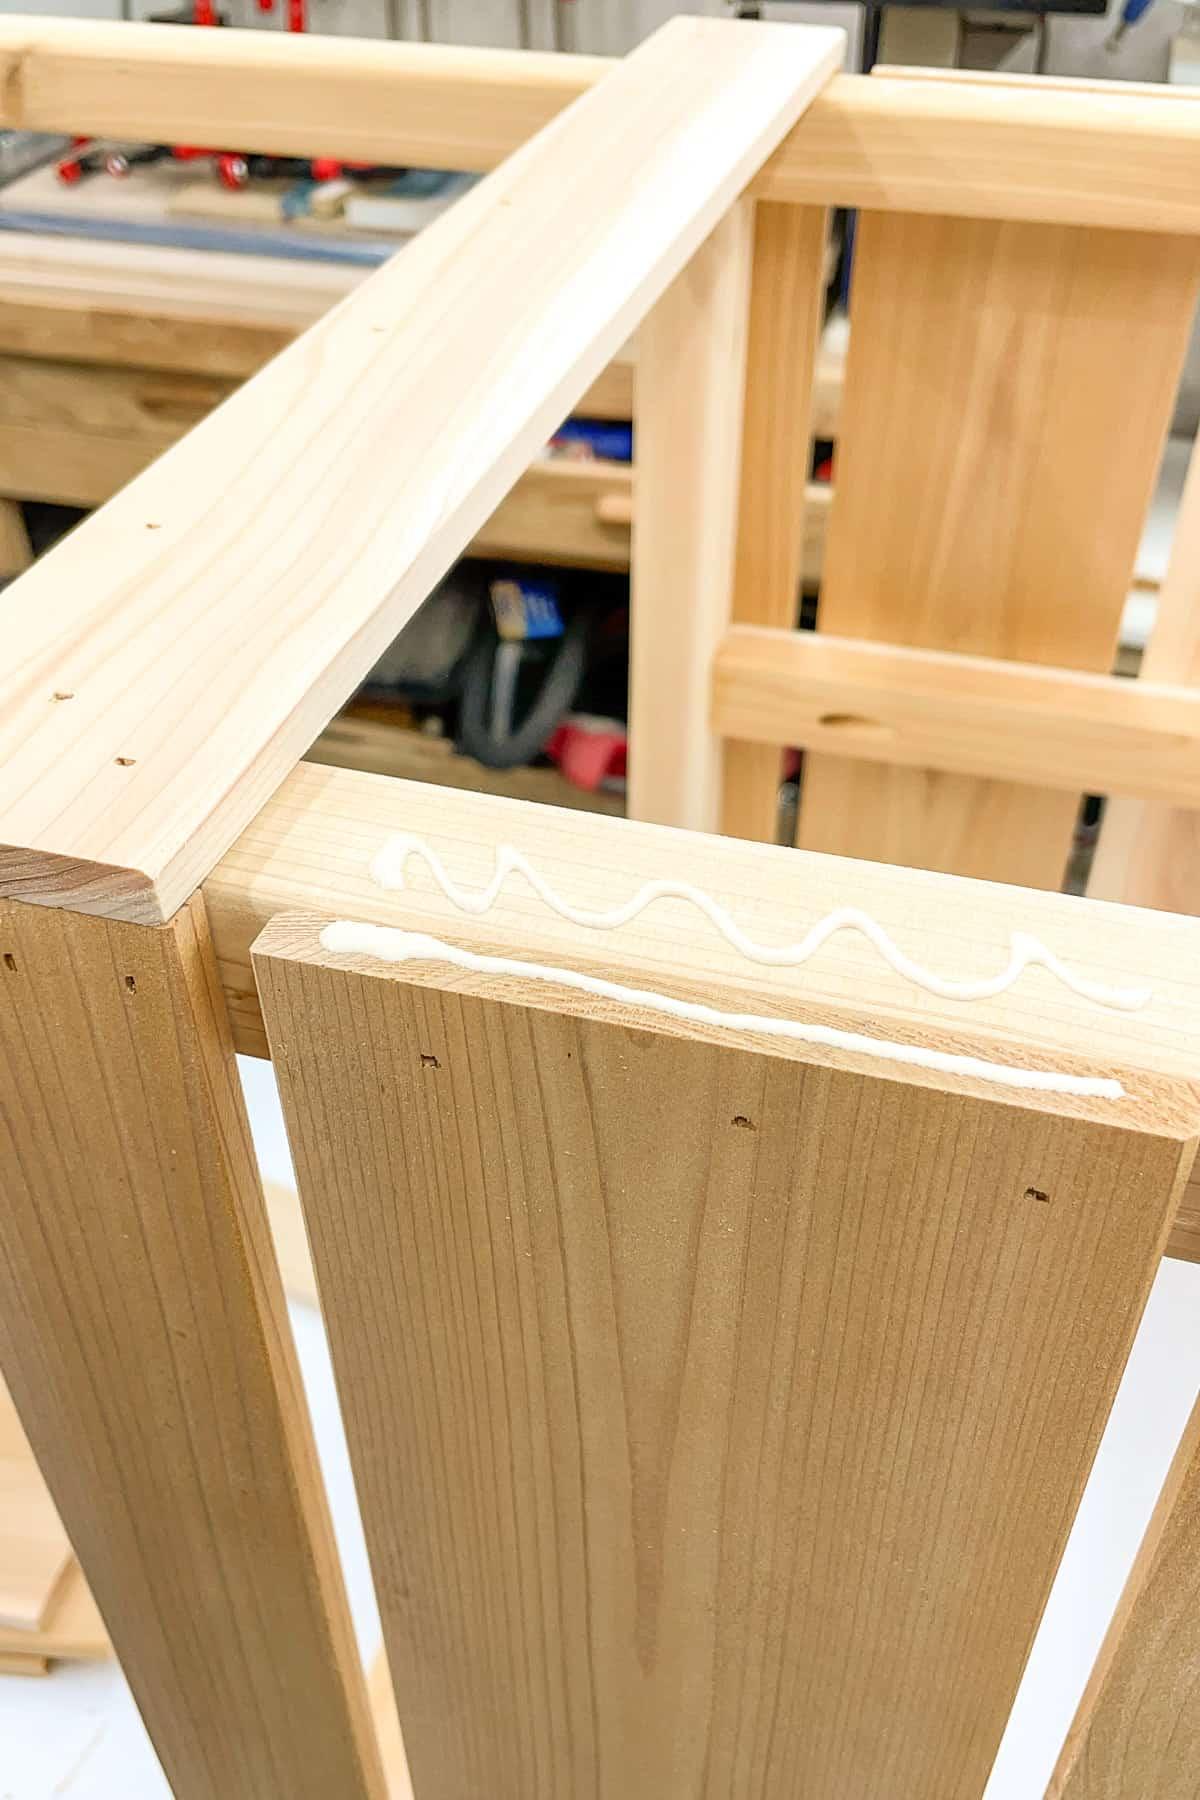 wood glue at joint between planter box slats and frame